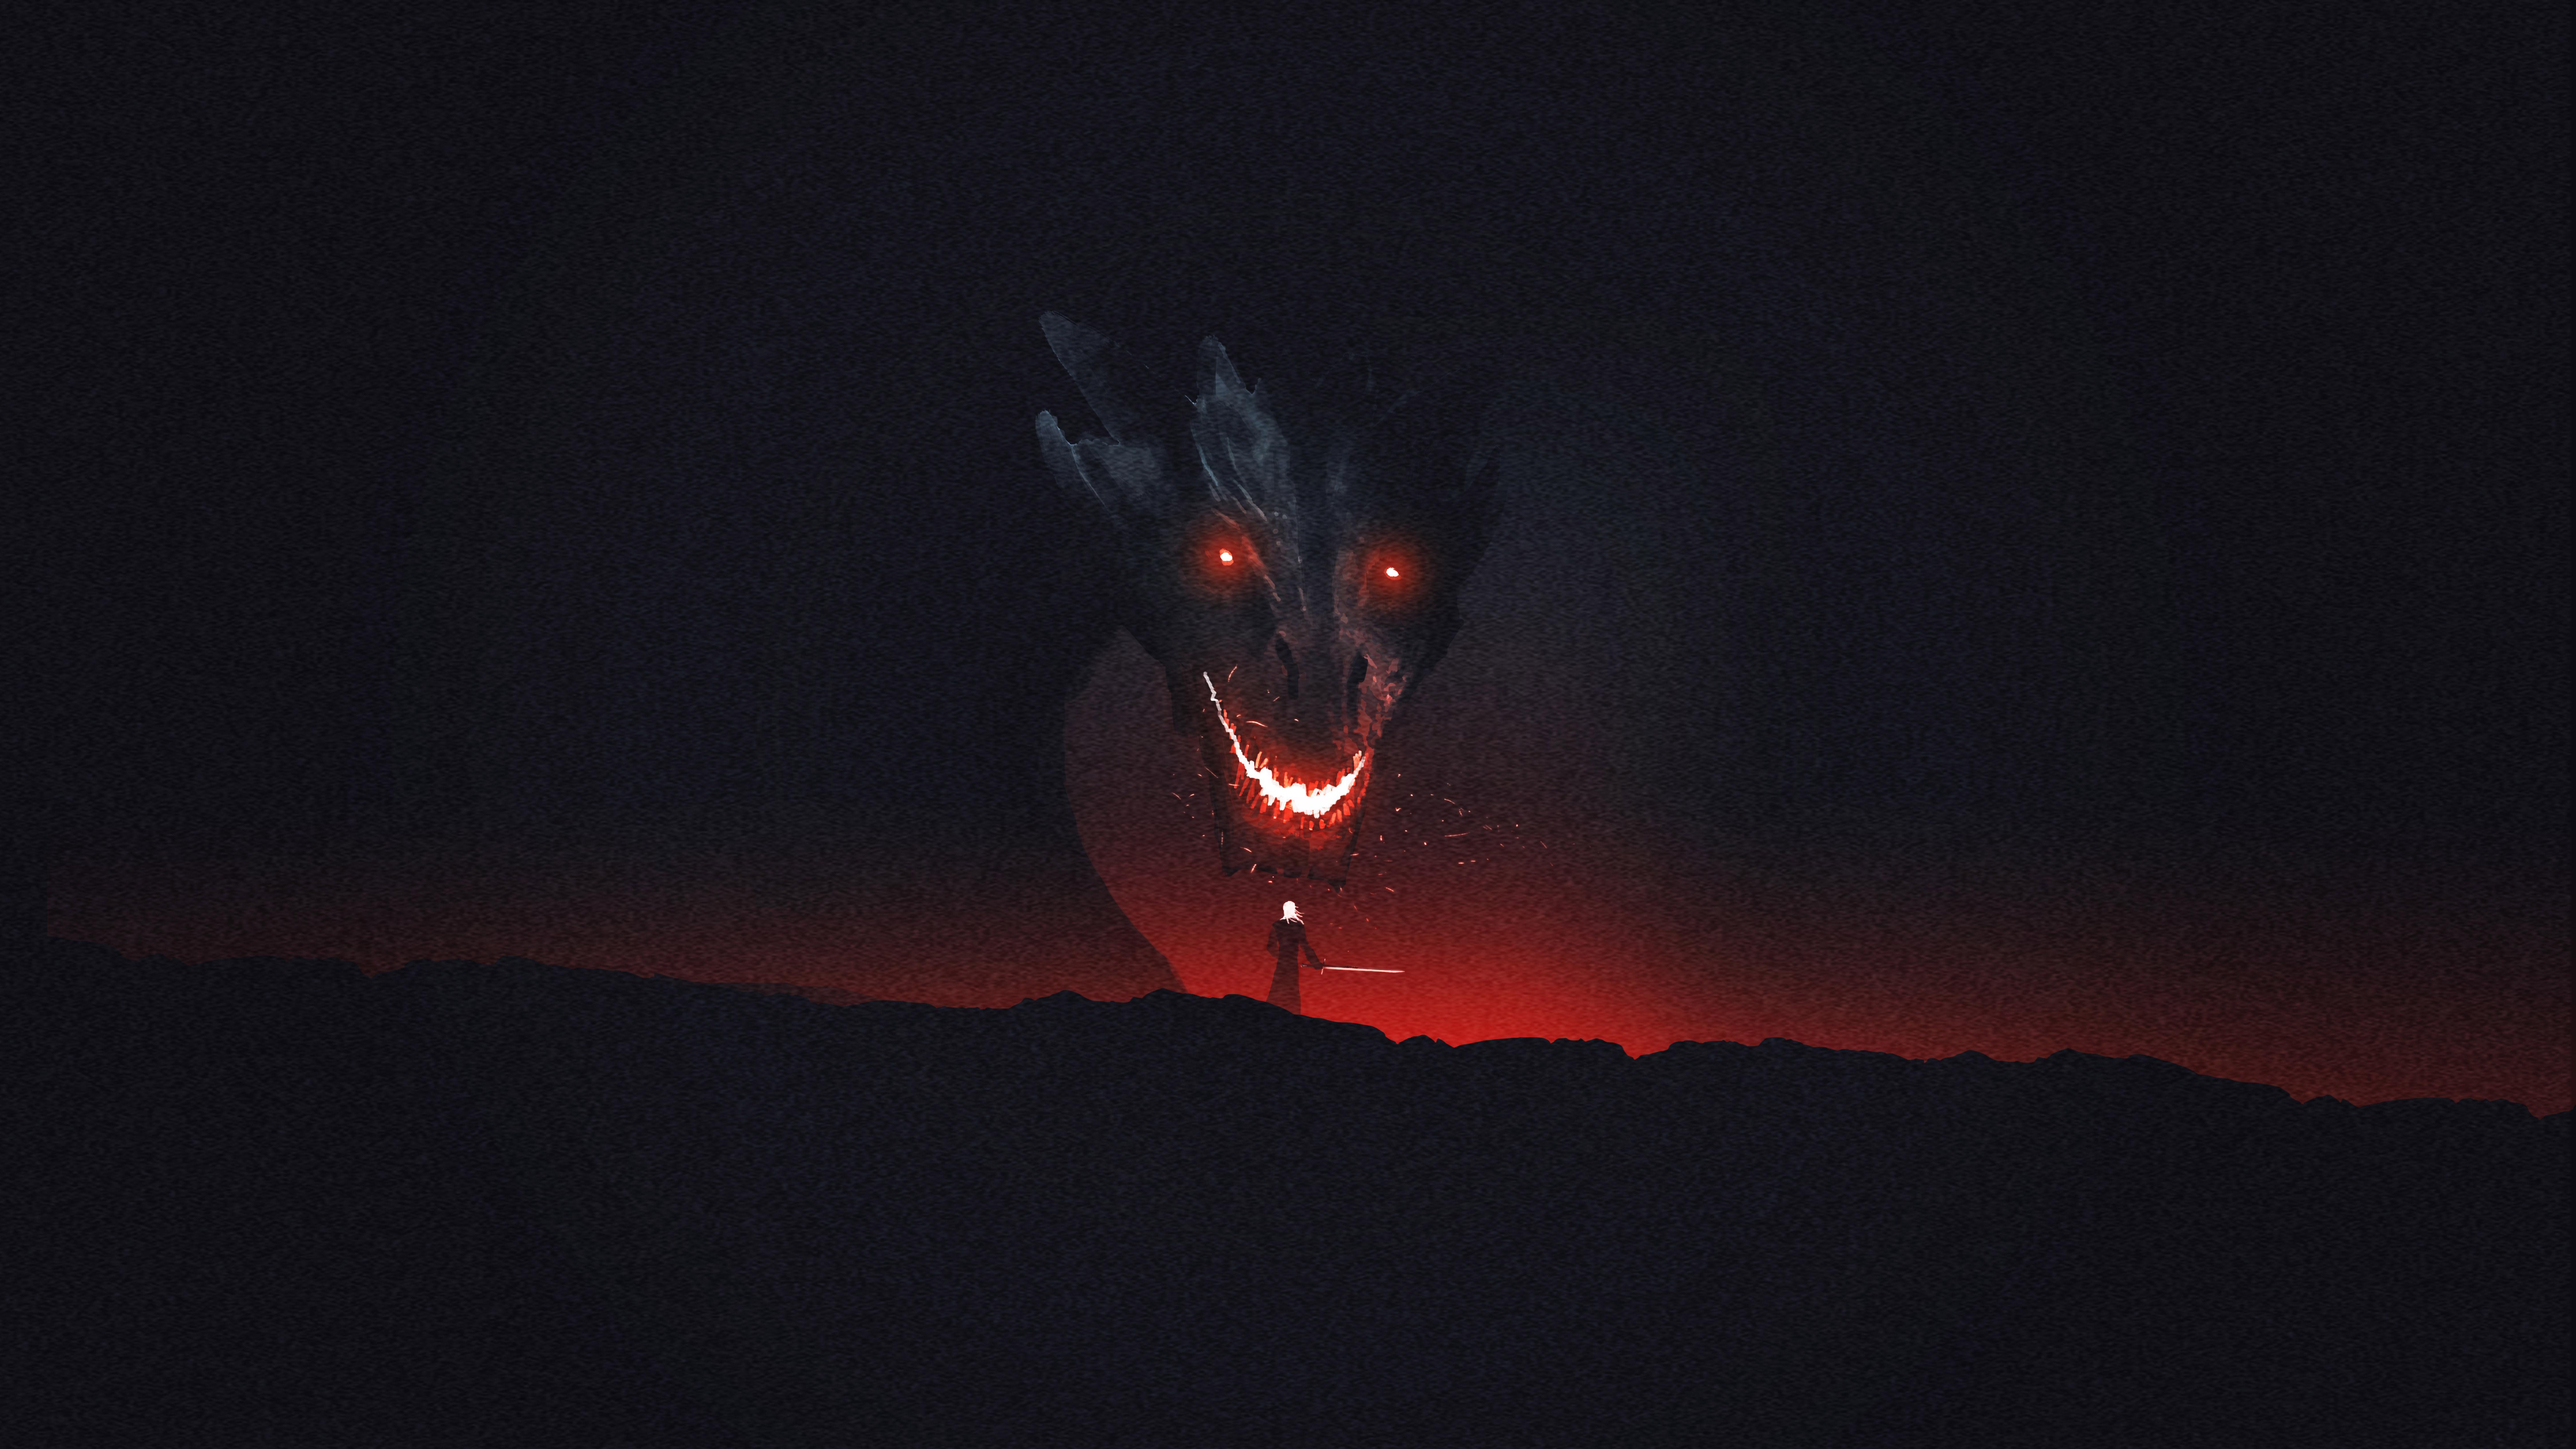 Popular Wallpaper Night Dragon - dragon-game-of-thrones-10k-artwork-ja  Photograph.jpg